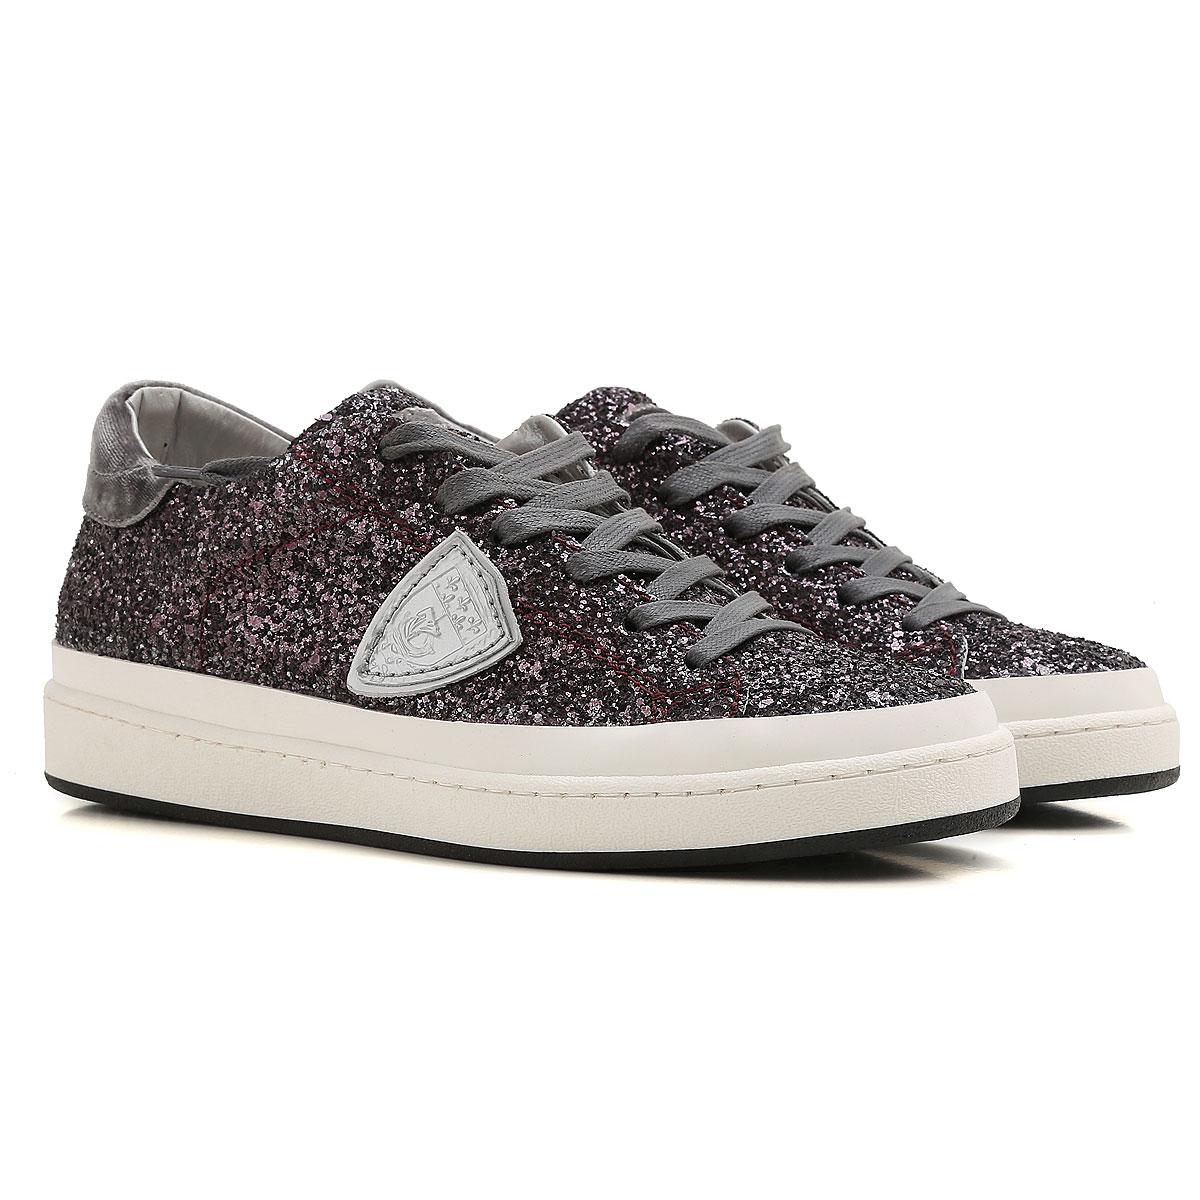 Philippe Model Sneakers for Women On Sale, Plum, Glitter, 2019, 3.5 4.5 5.5 6.5 8.5 9.5